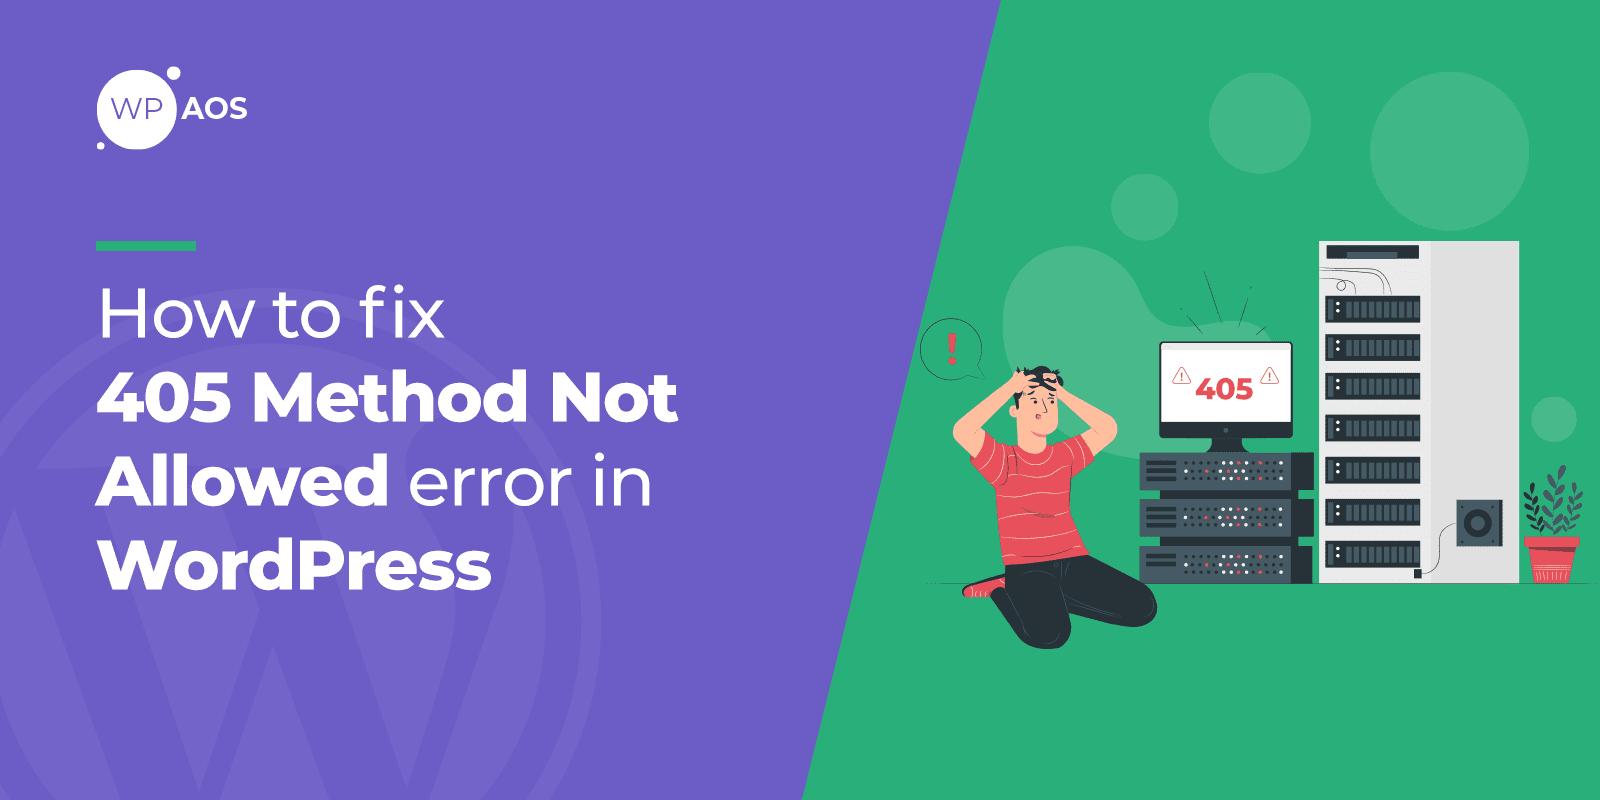 405 error, method not allowed, wordpress maintenance, wpaos